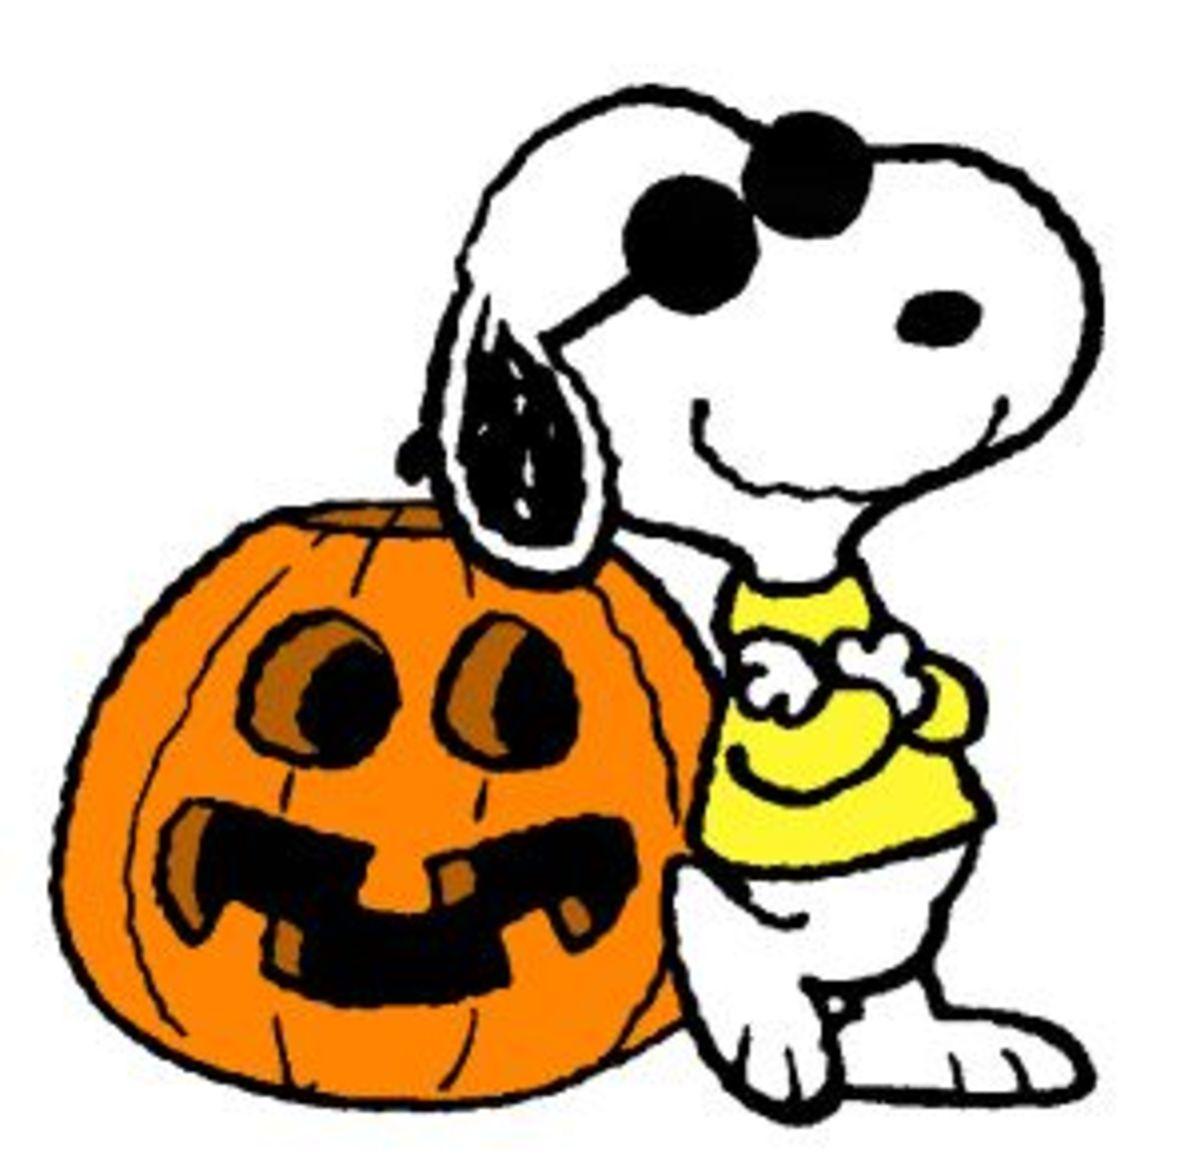 Joe Cool Halloween